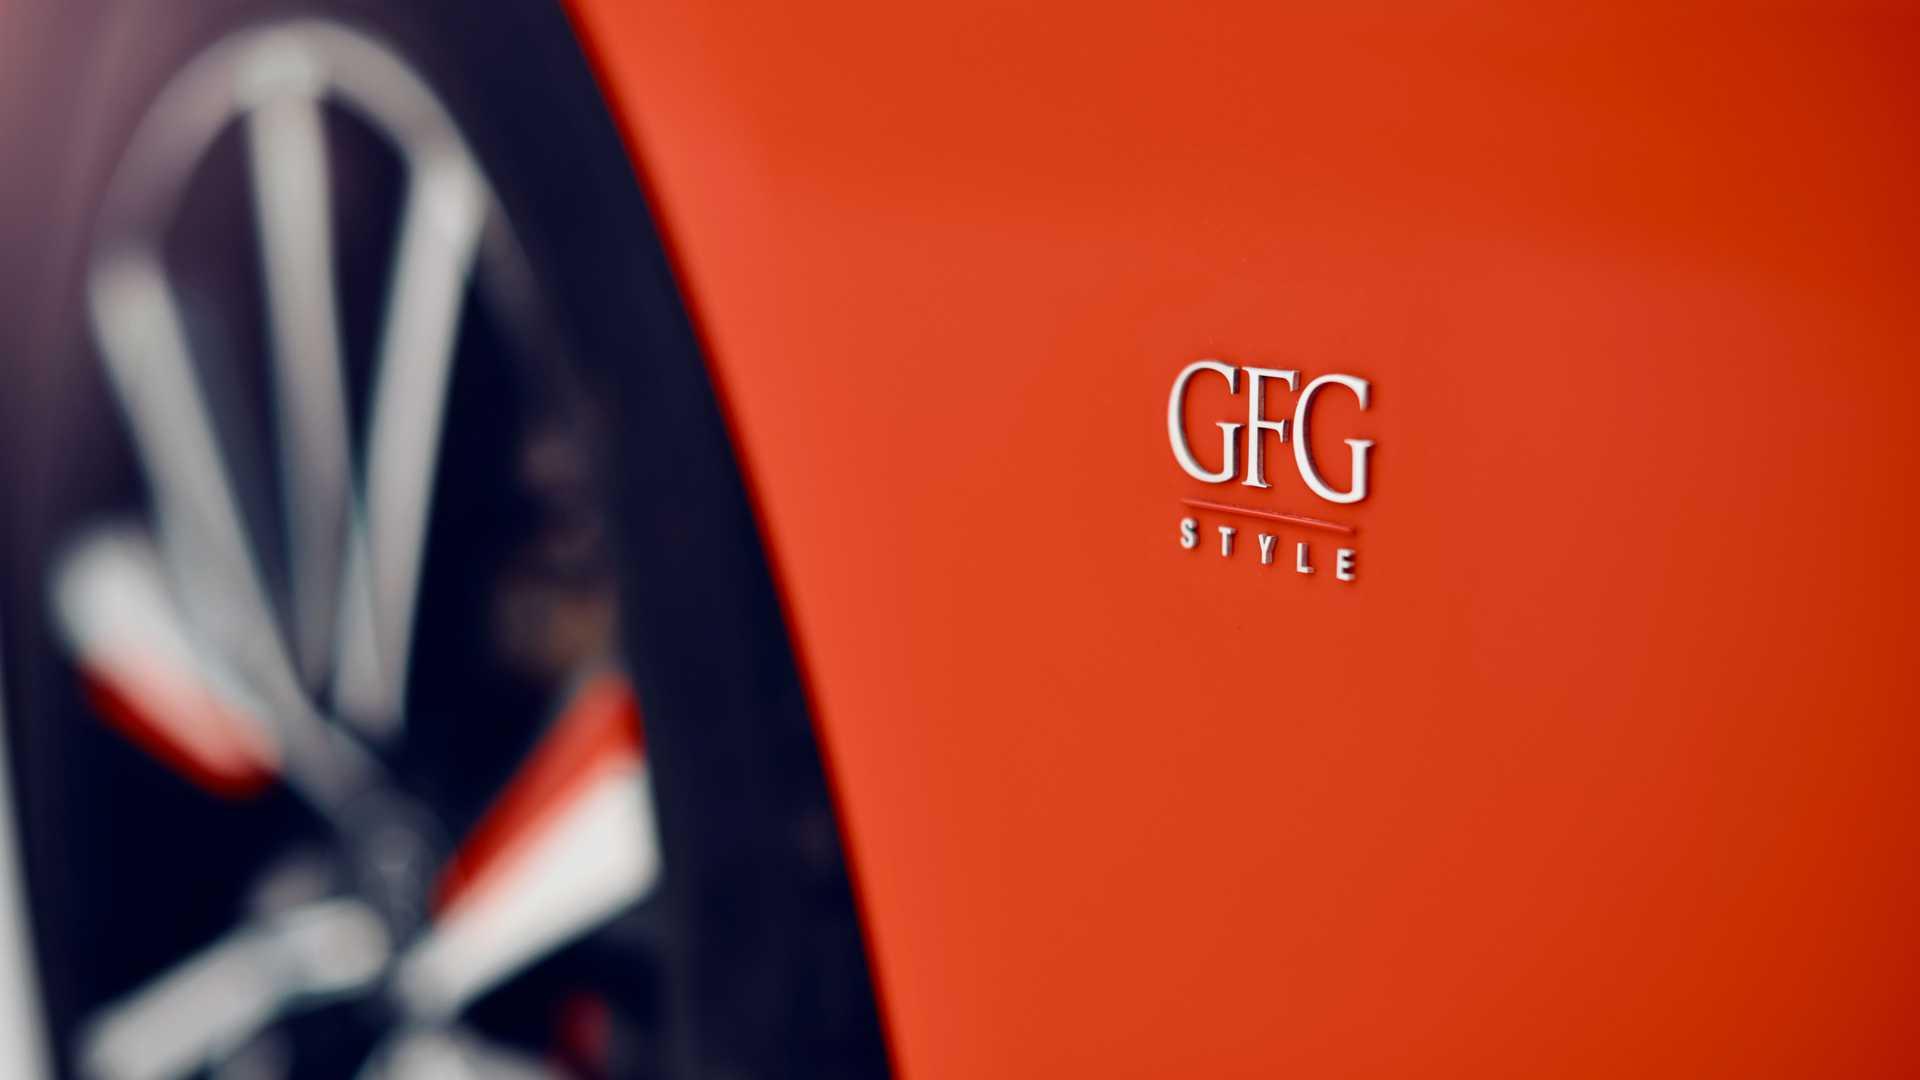 gfg-style-kangaroo (38)